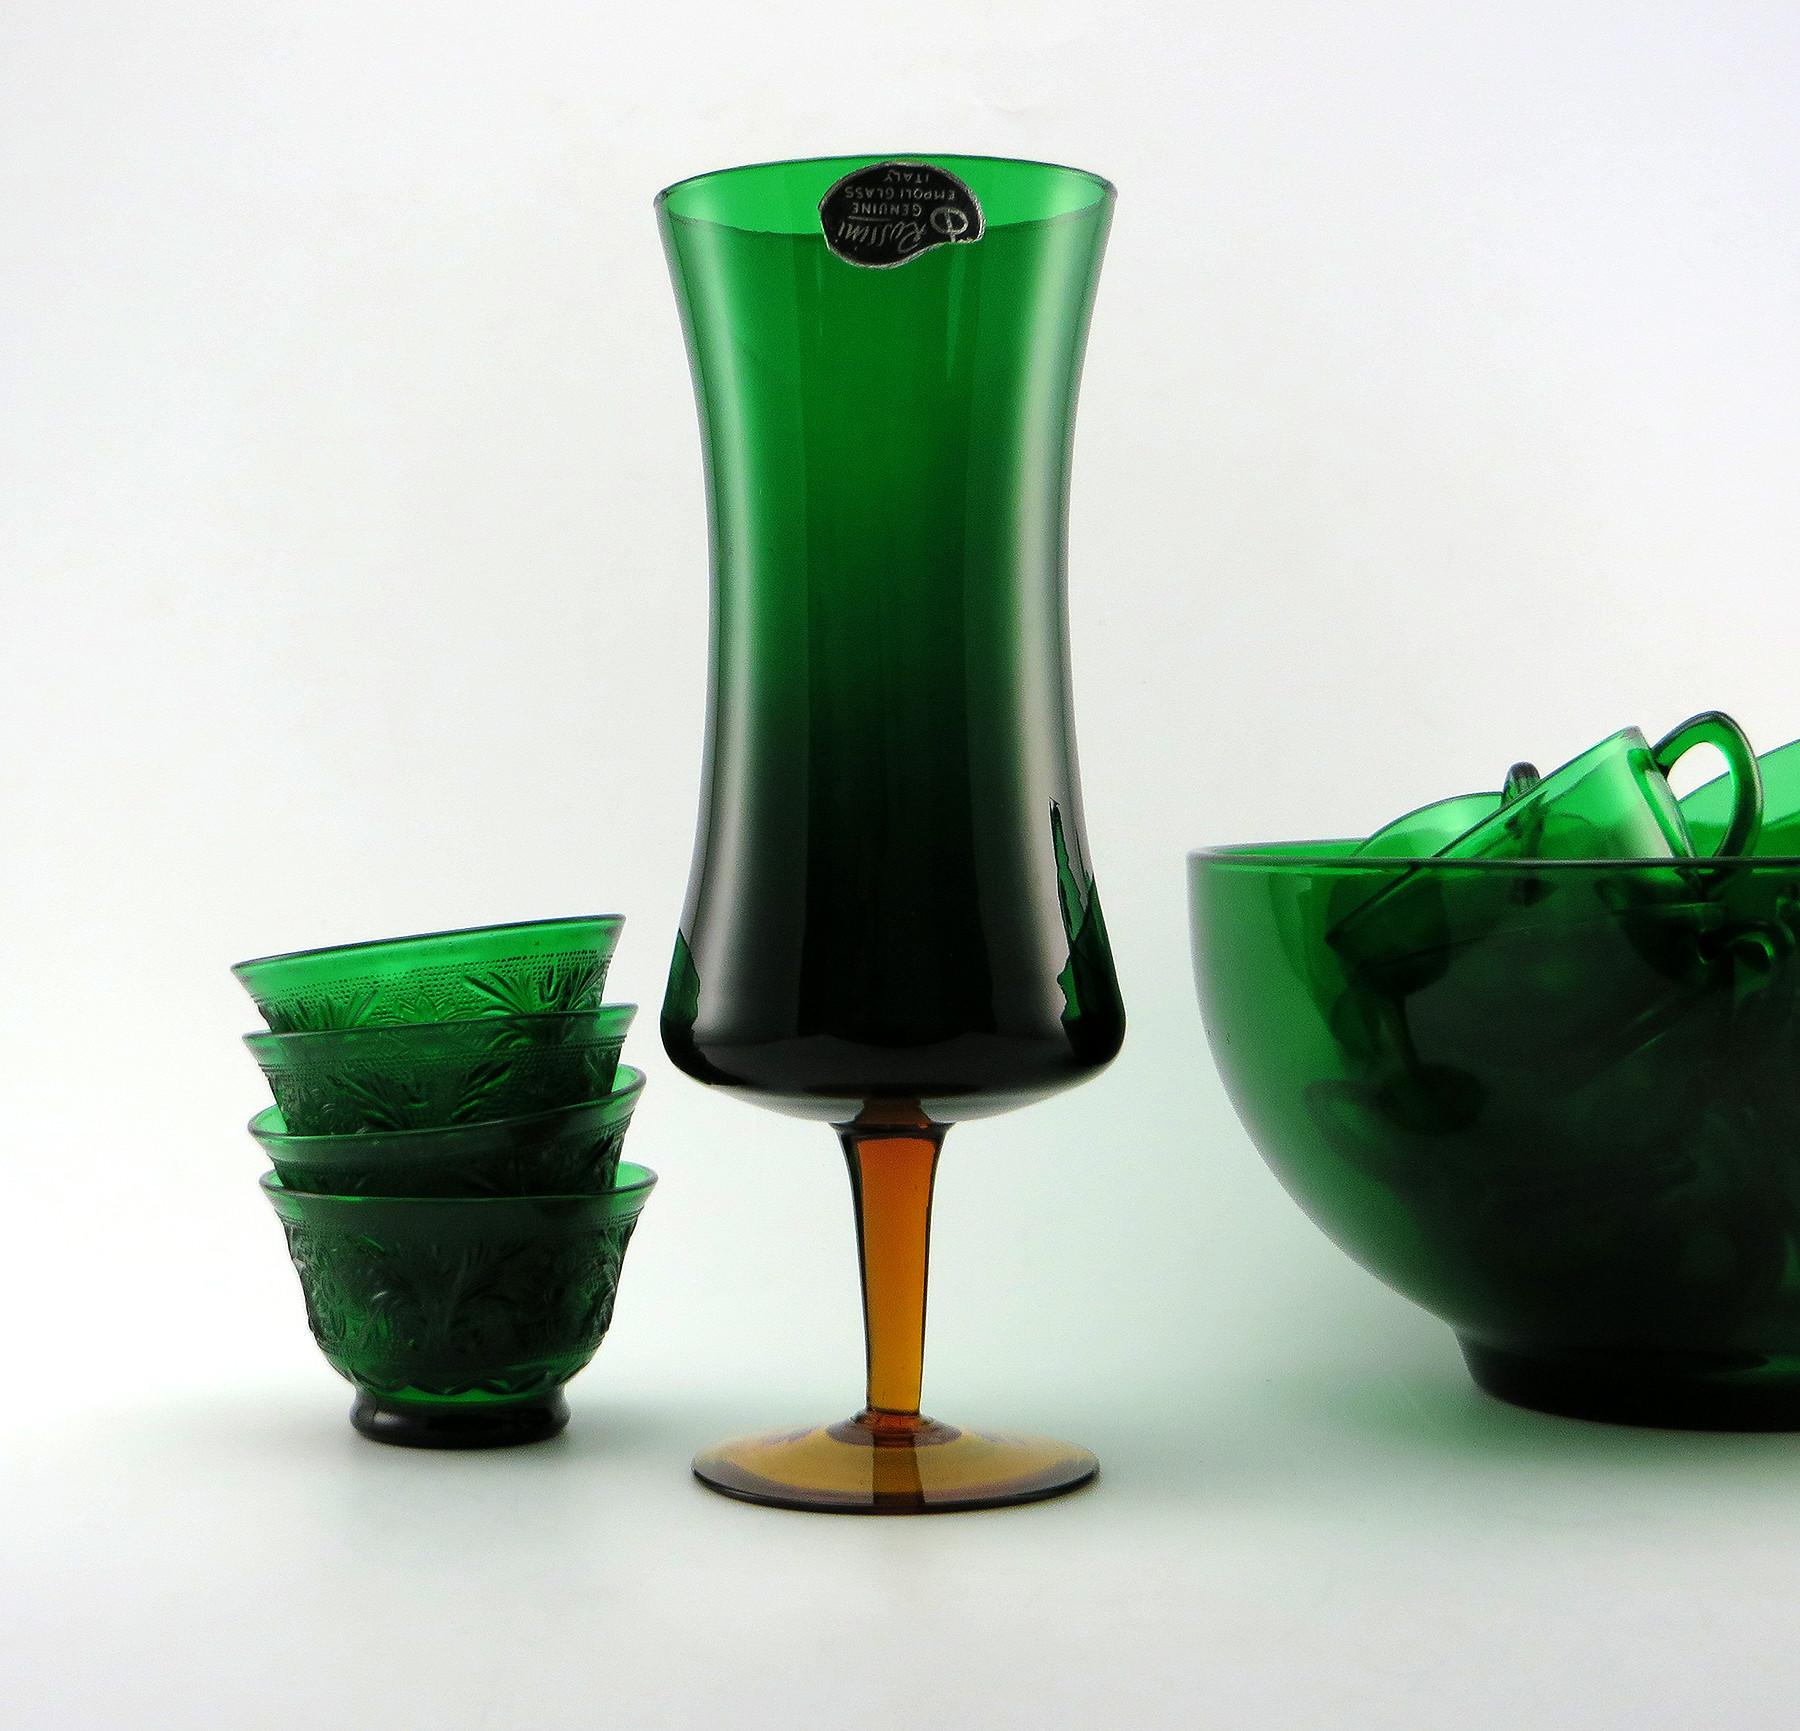 iridescent art glass vase of rossini empoli art glass retro modern vase with label retro art glass inside rossini empoli art glass retro modern vase with label